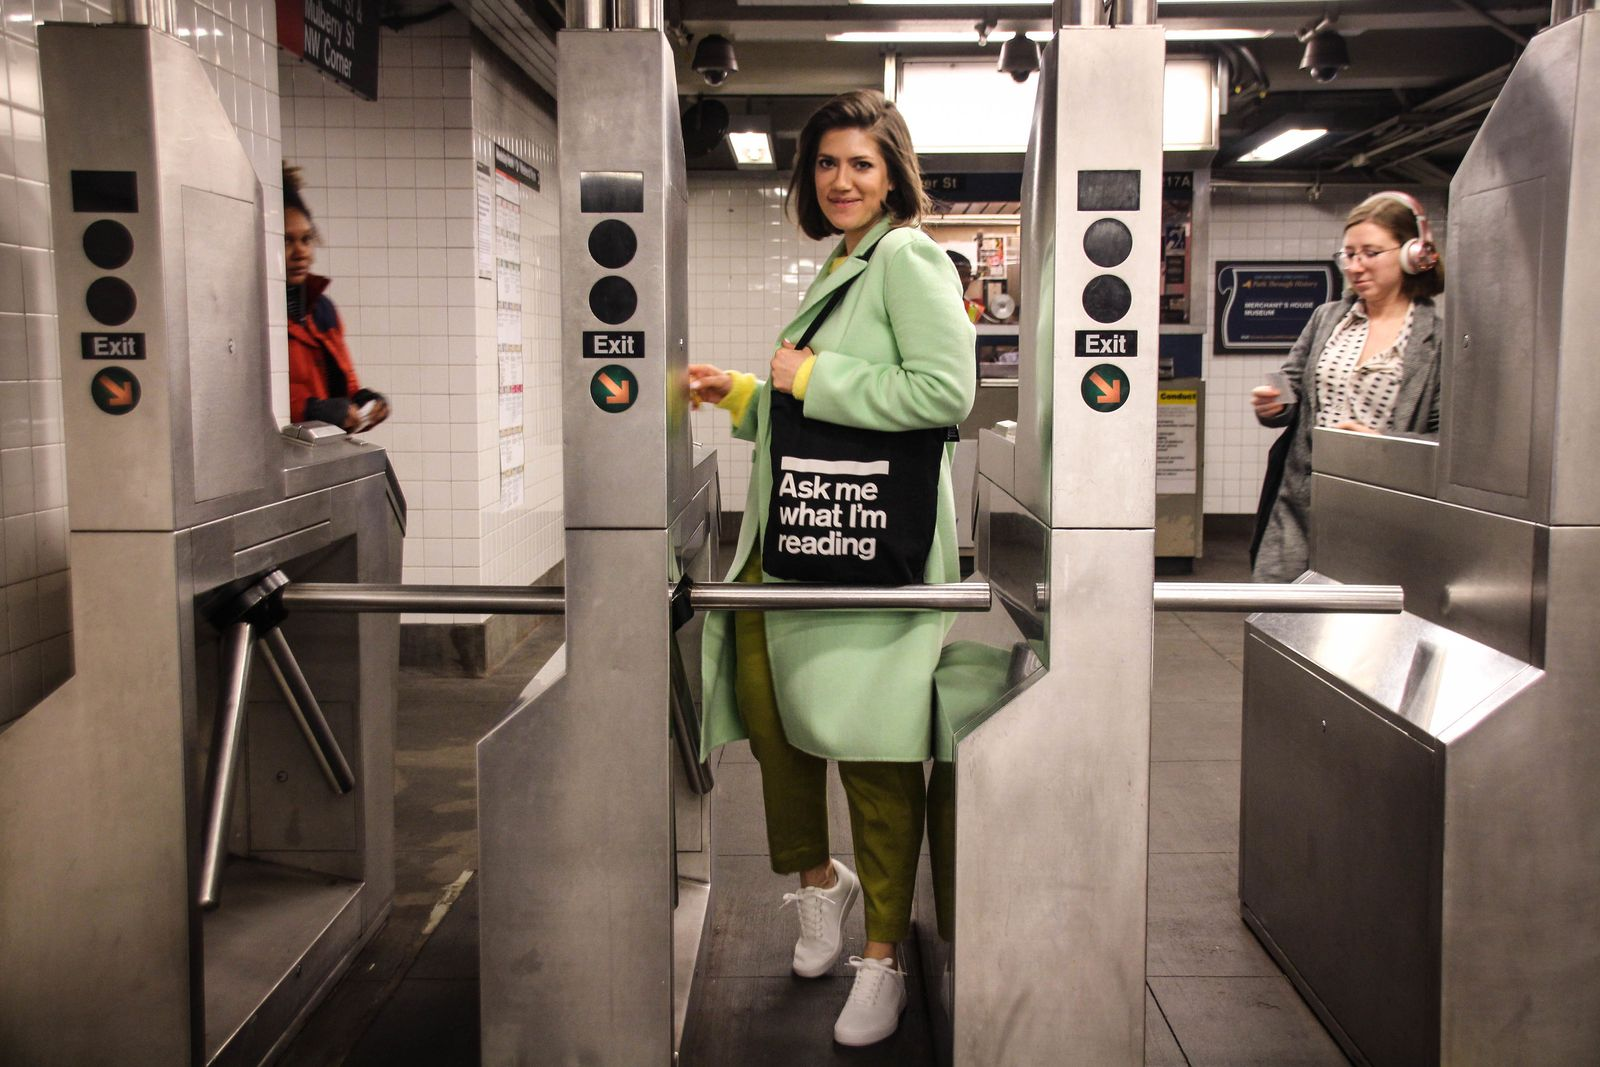 Deutsche porträtiert New Yorker U-Bahn-Leser